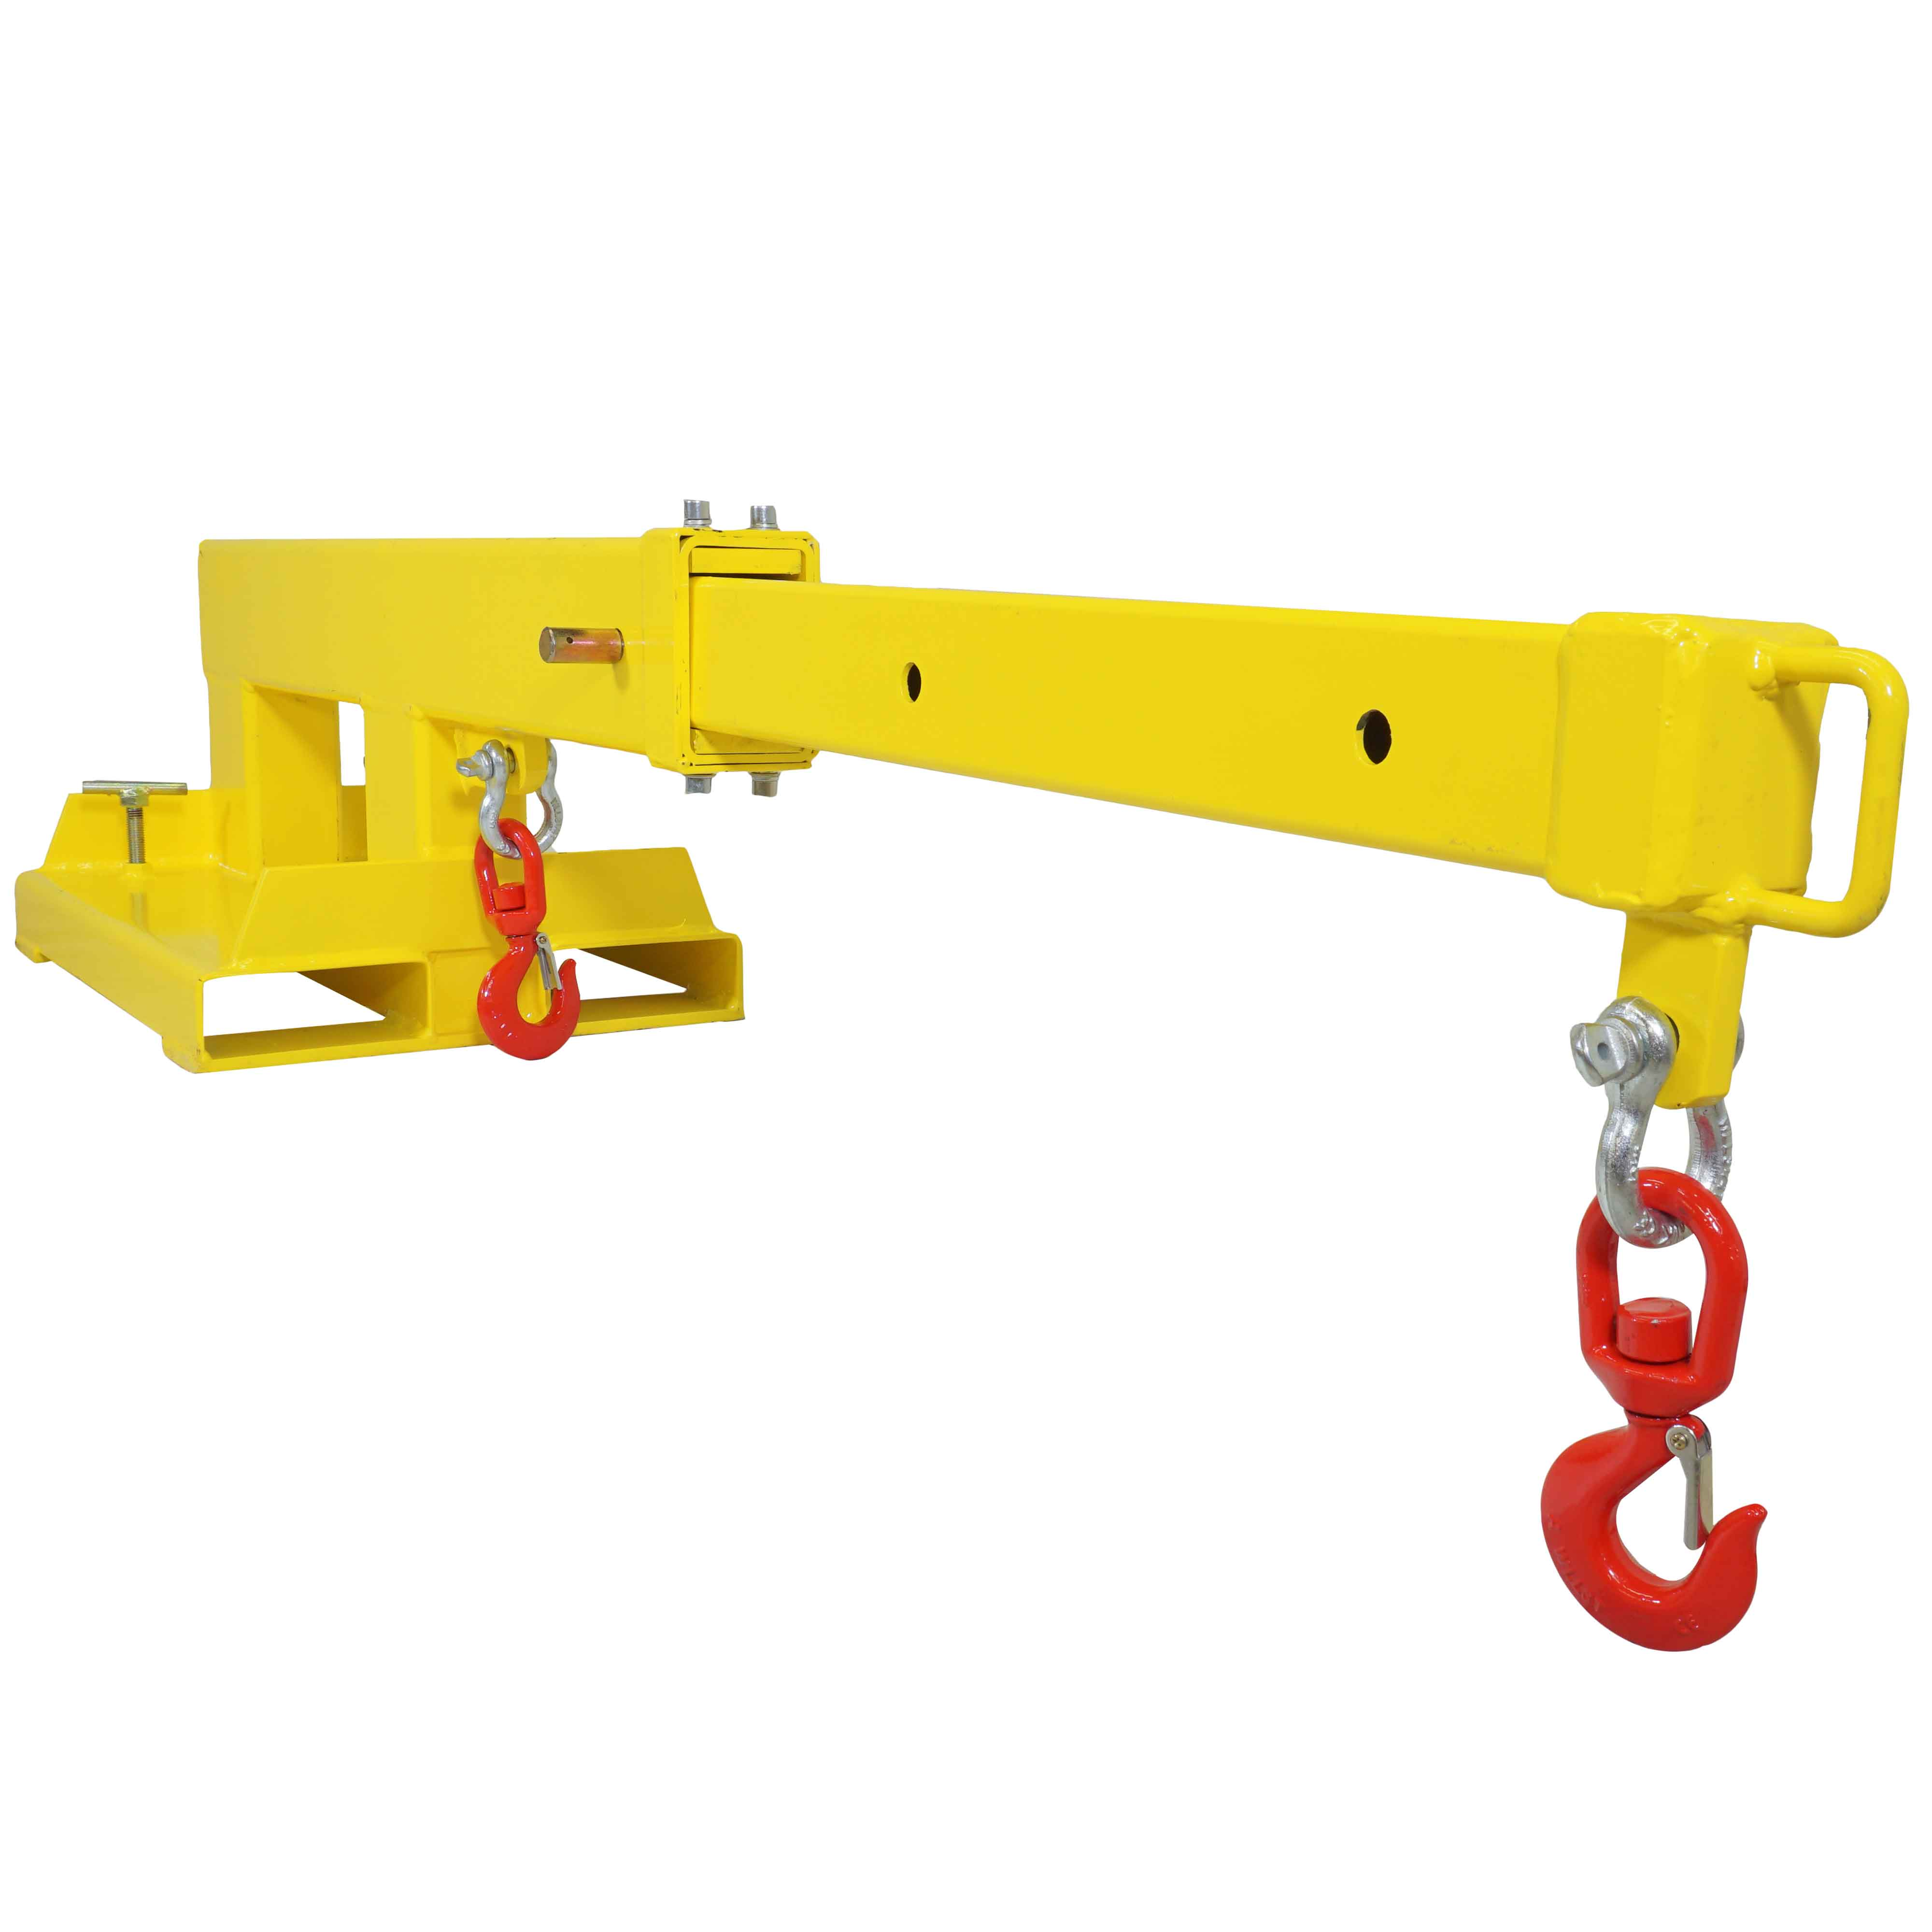 Forklift Mobile Crane Lifting Hoist Truss Jib Boom 2 Hooks 5500 lb Capacity by Titan Attachments